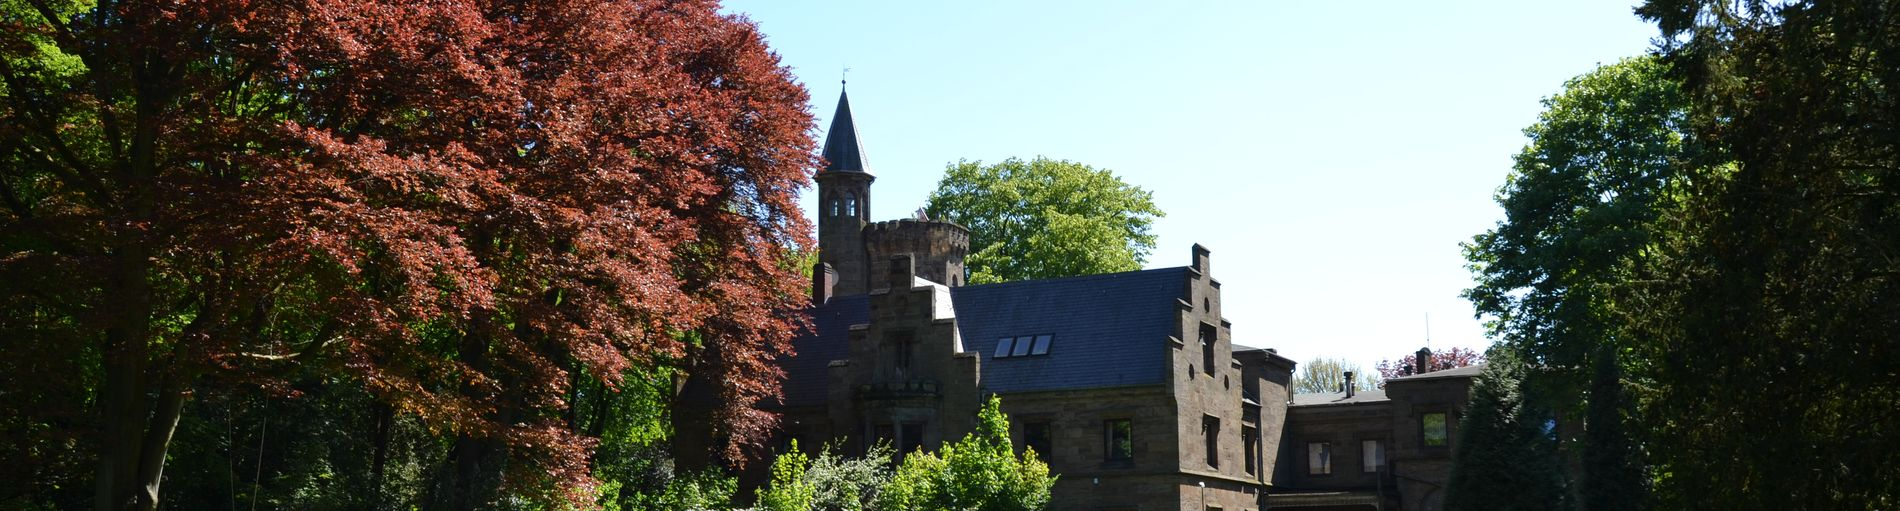 Wätjens Schloss in Wätjens Park